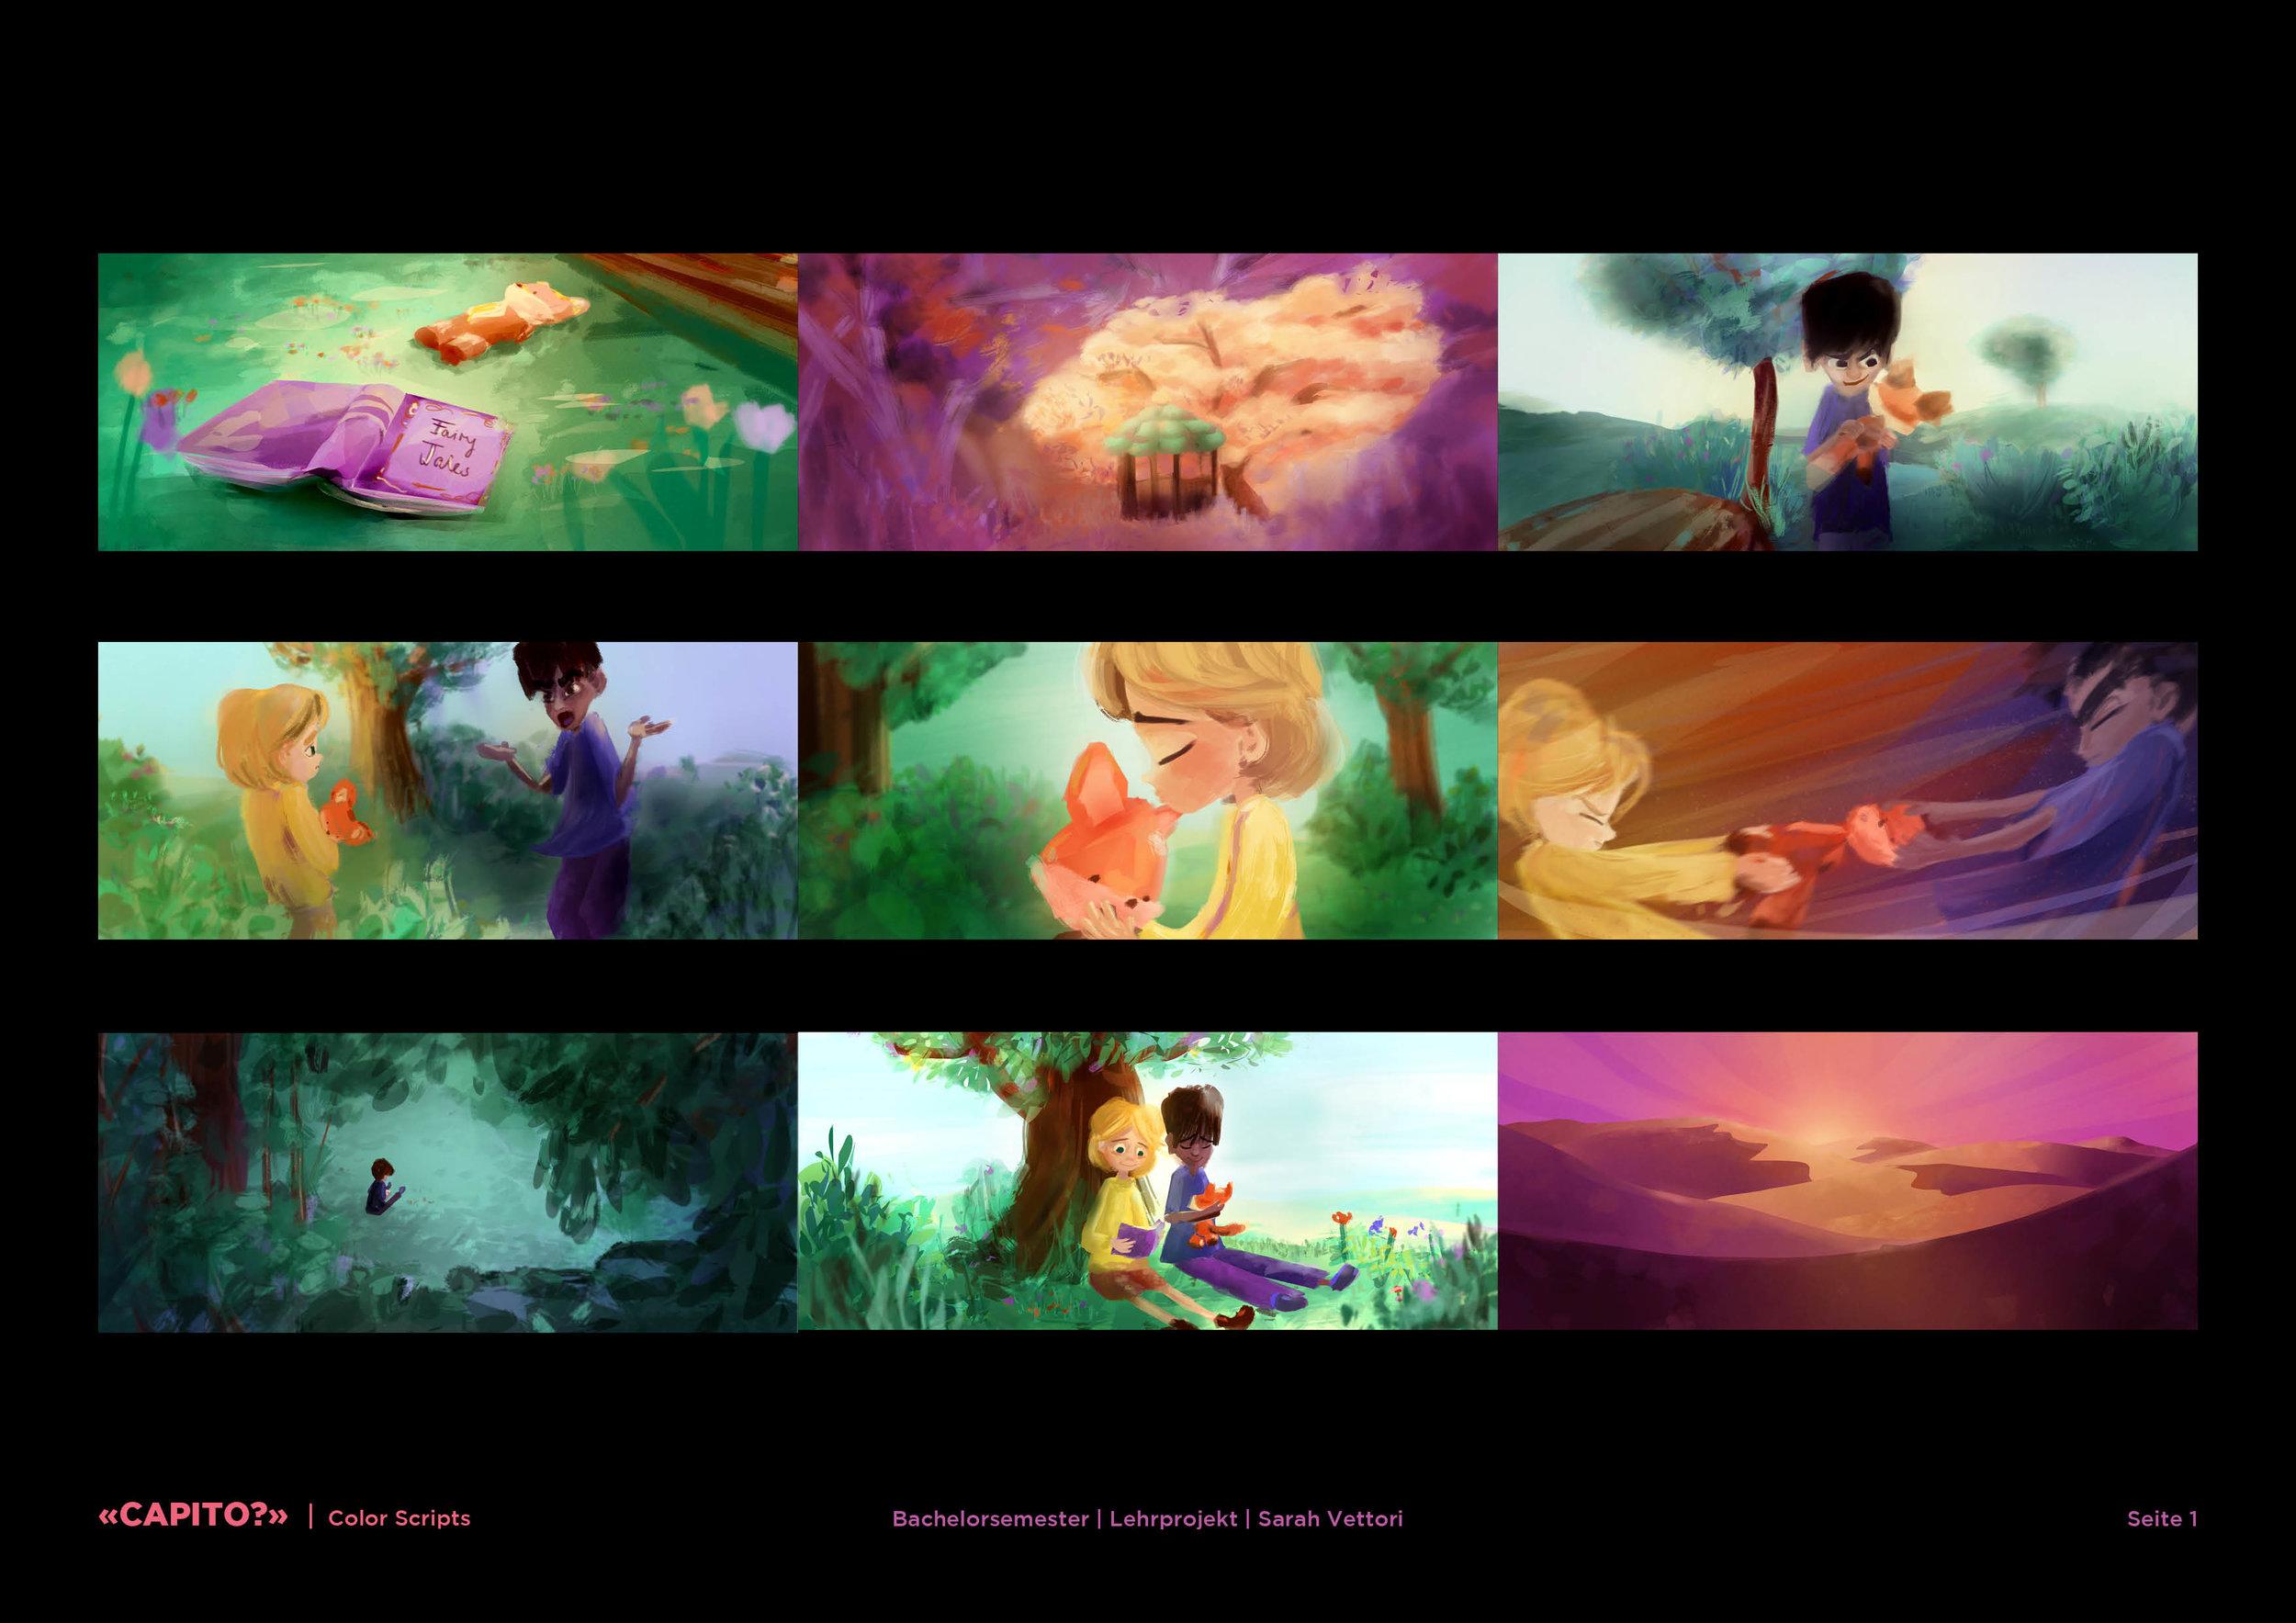 Capito_ColorScripts_BA_SarahVettori.jpg